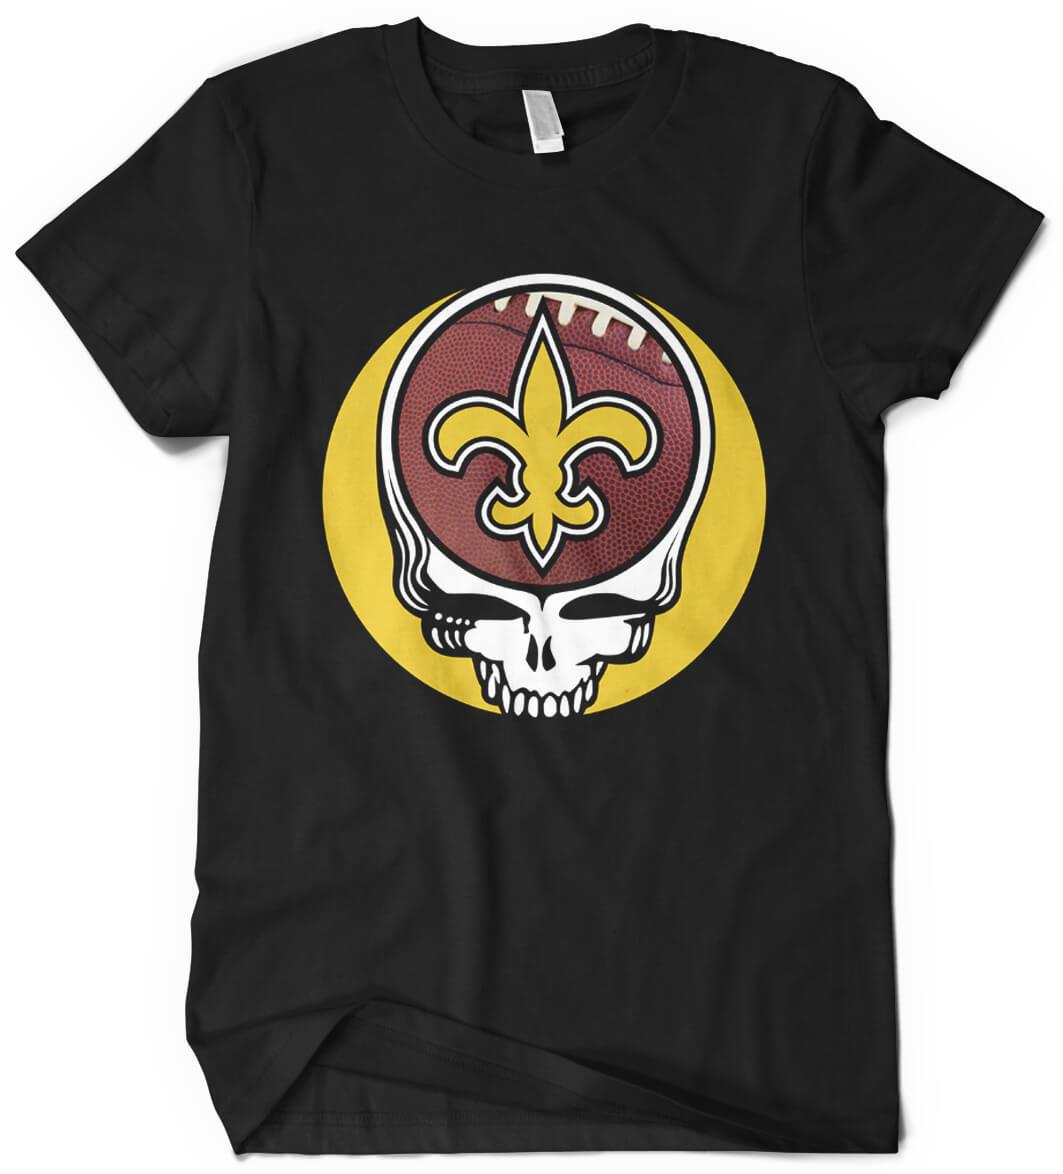 San francisco 49ers grateful dead custom printed t shirt for T shirt printing new orleans